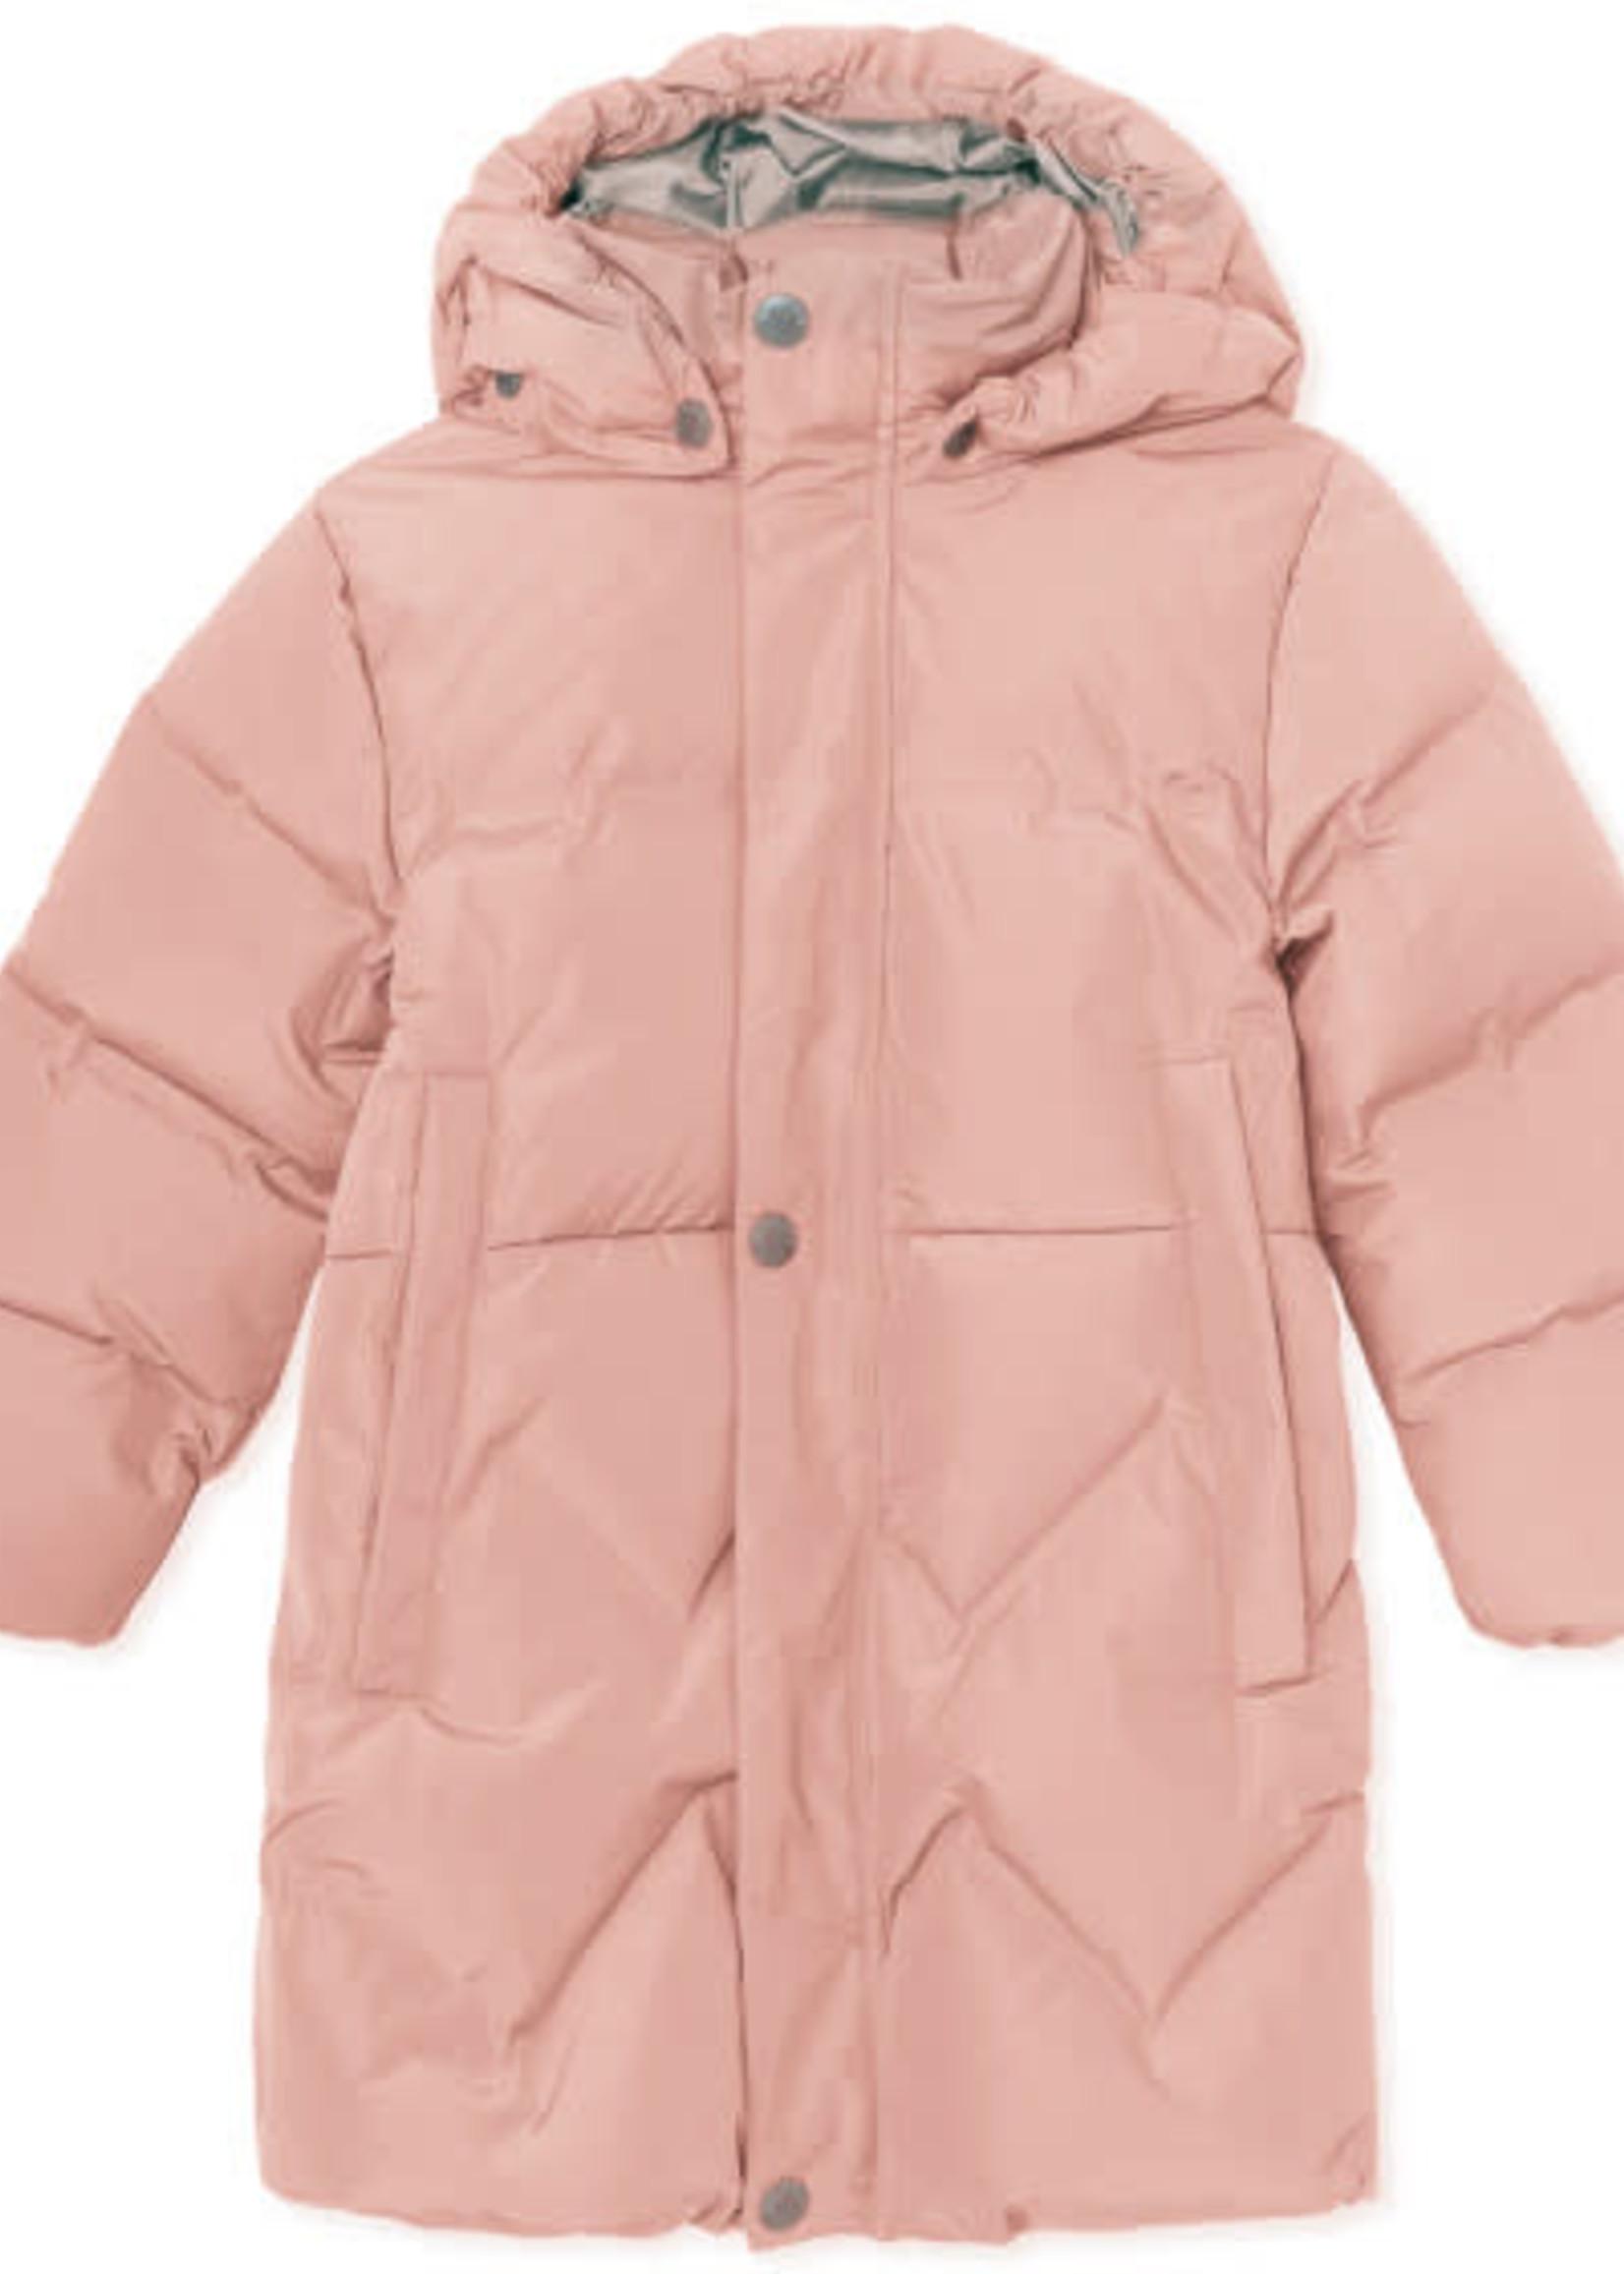 Mini a Ture Mini A Ture Isabelle Jacket - Tuscany Skin 8Y